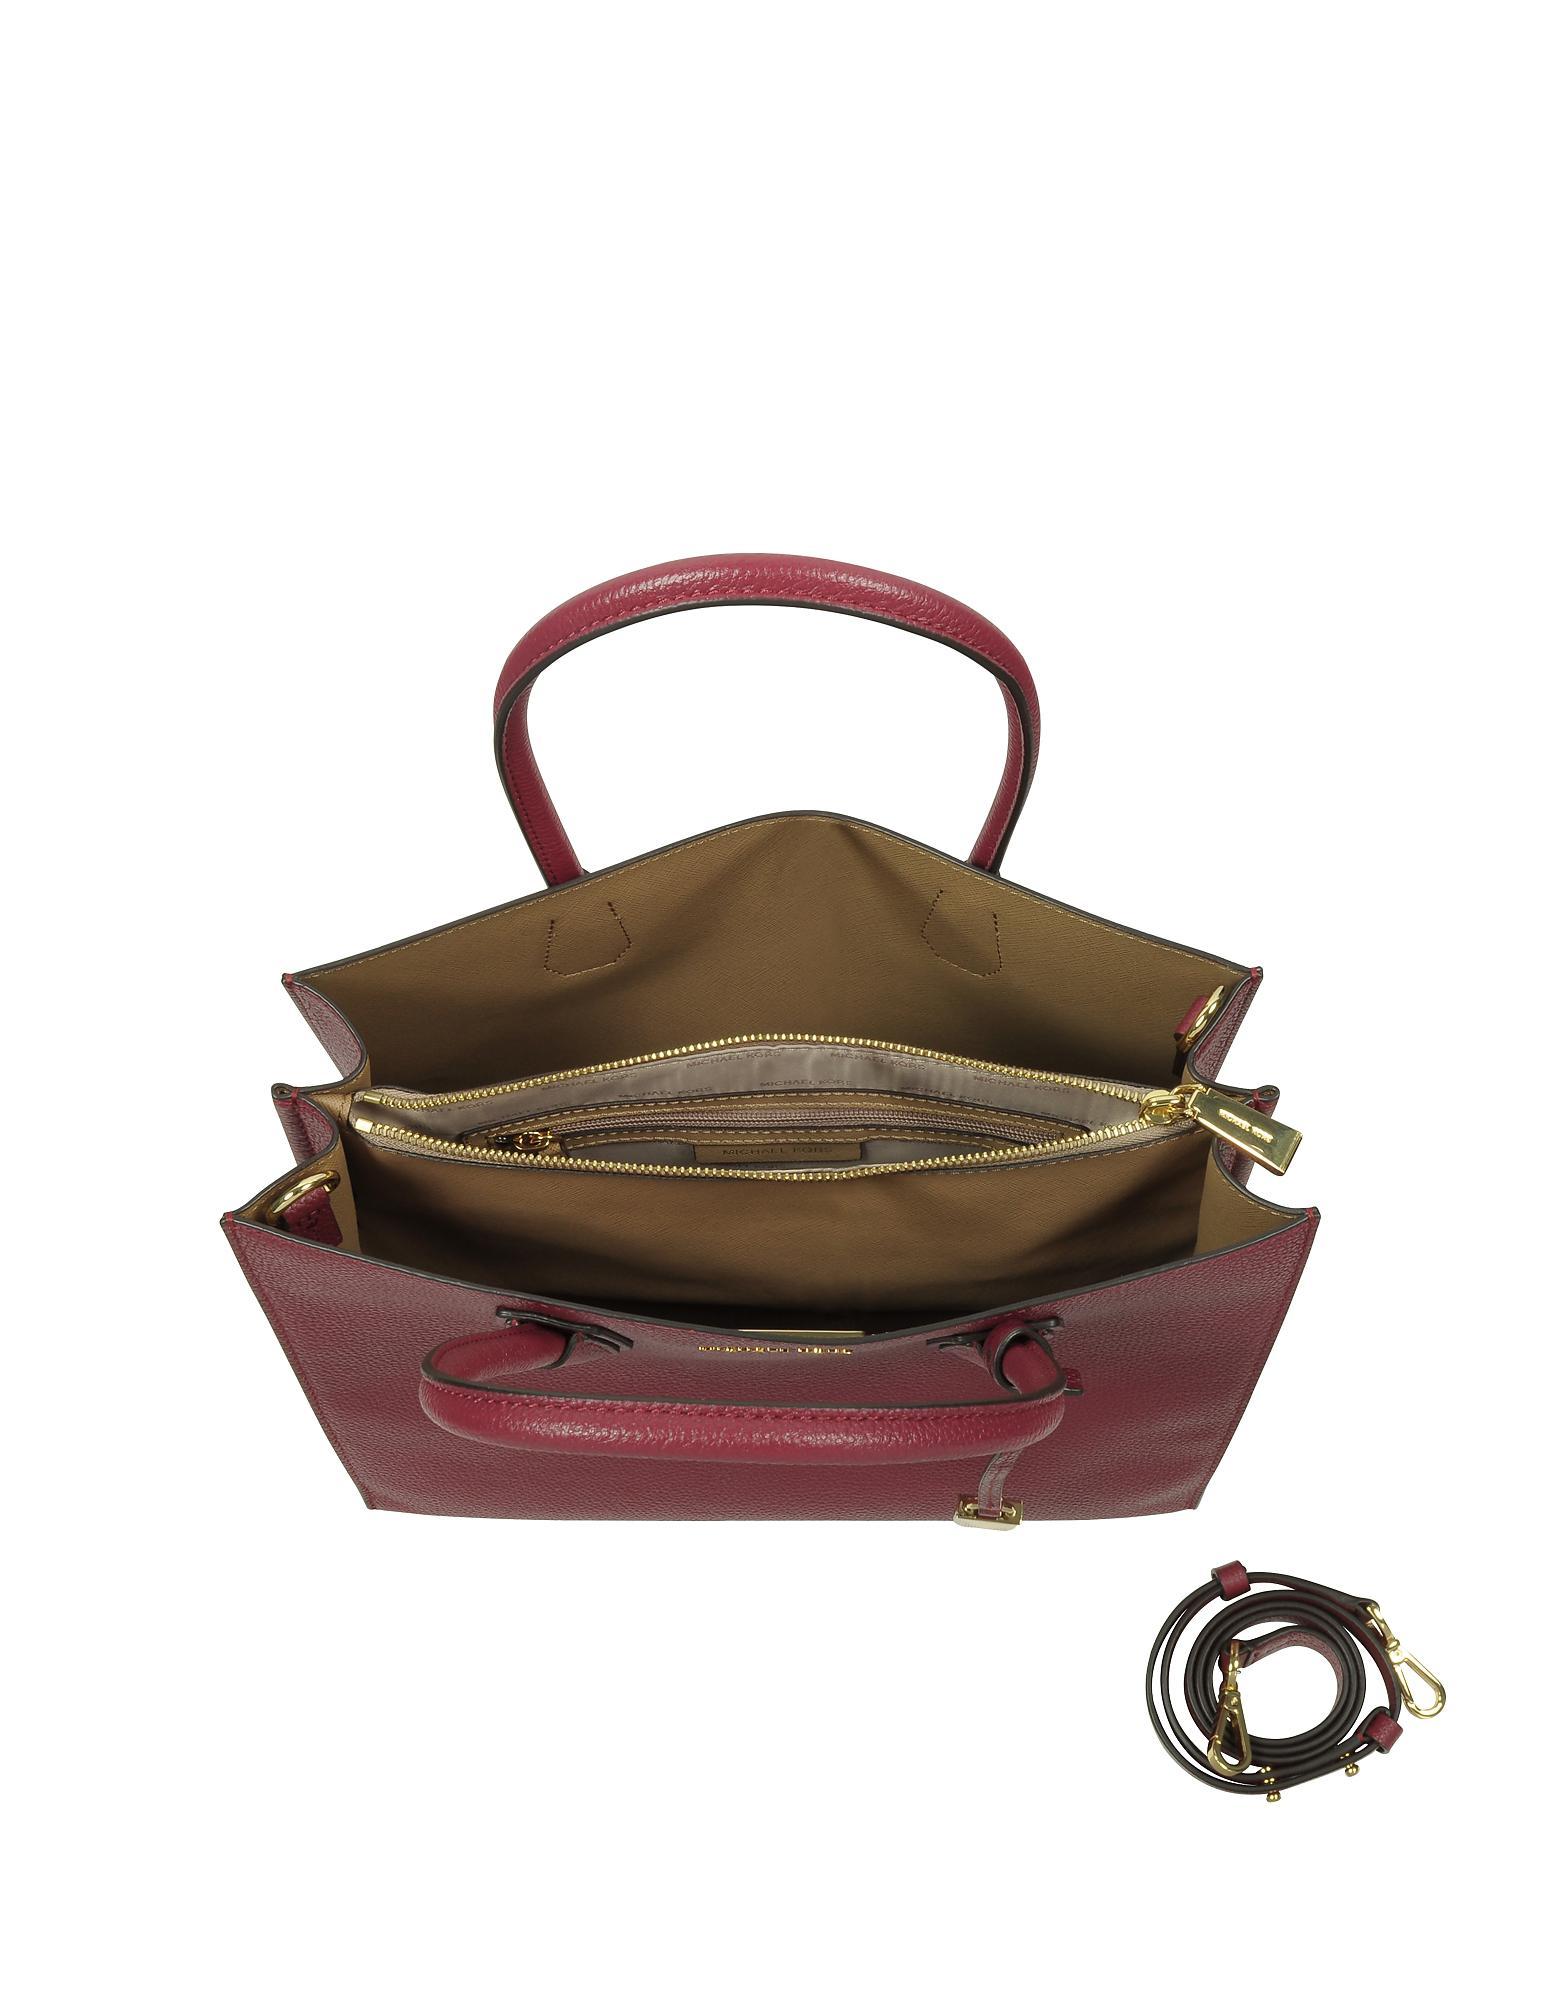 936f9ffd76da Lyst - Michael Kors Mercer Large Mulberry Pebble Leather Convertible ...